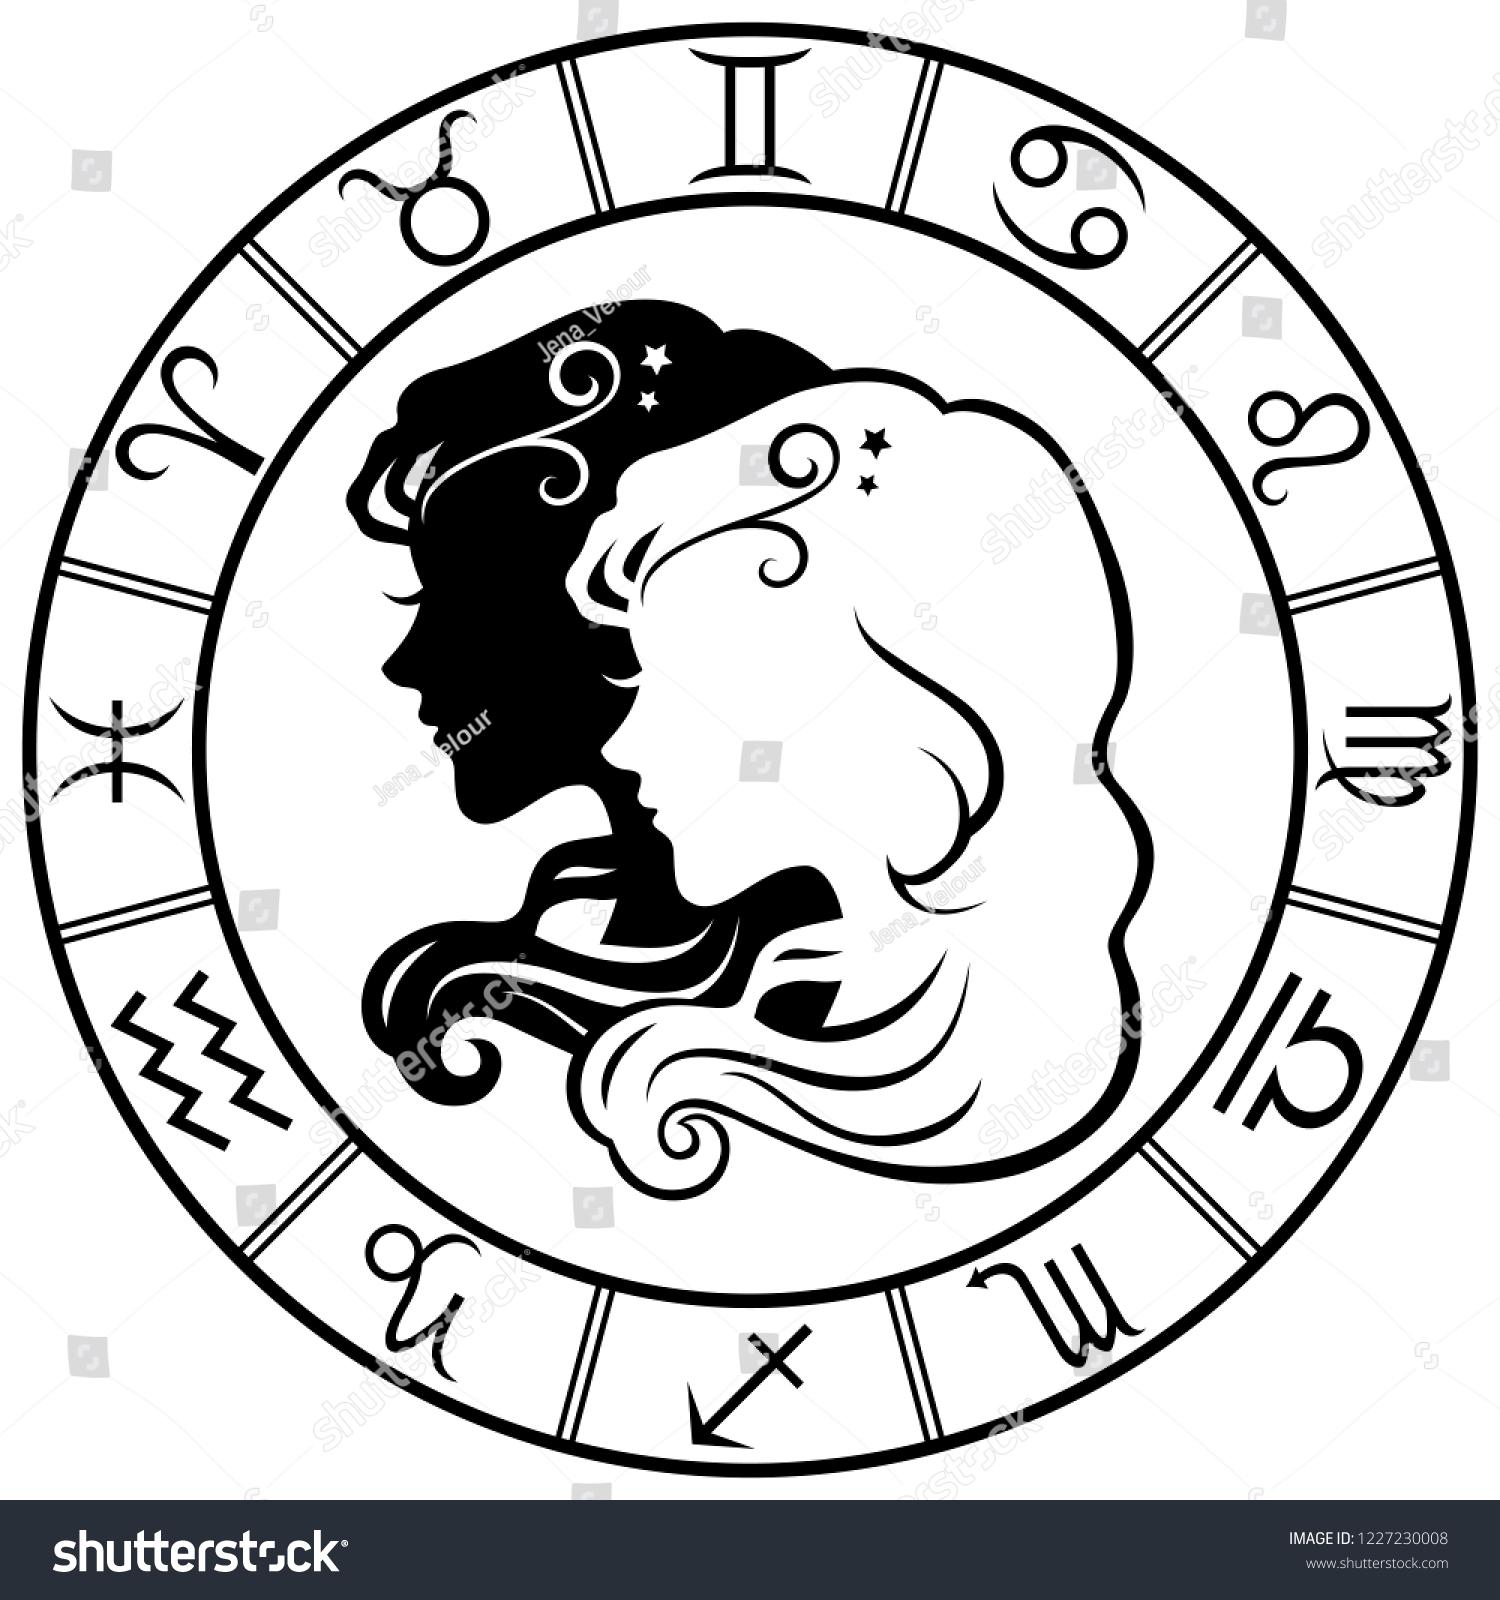 4b5f2709b Gemini. Horoscope. Zodiac sign. Silhouette isolated on white background.